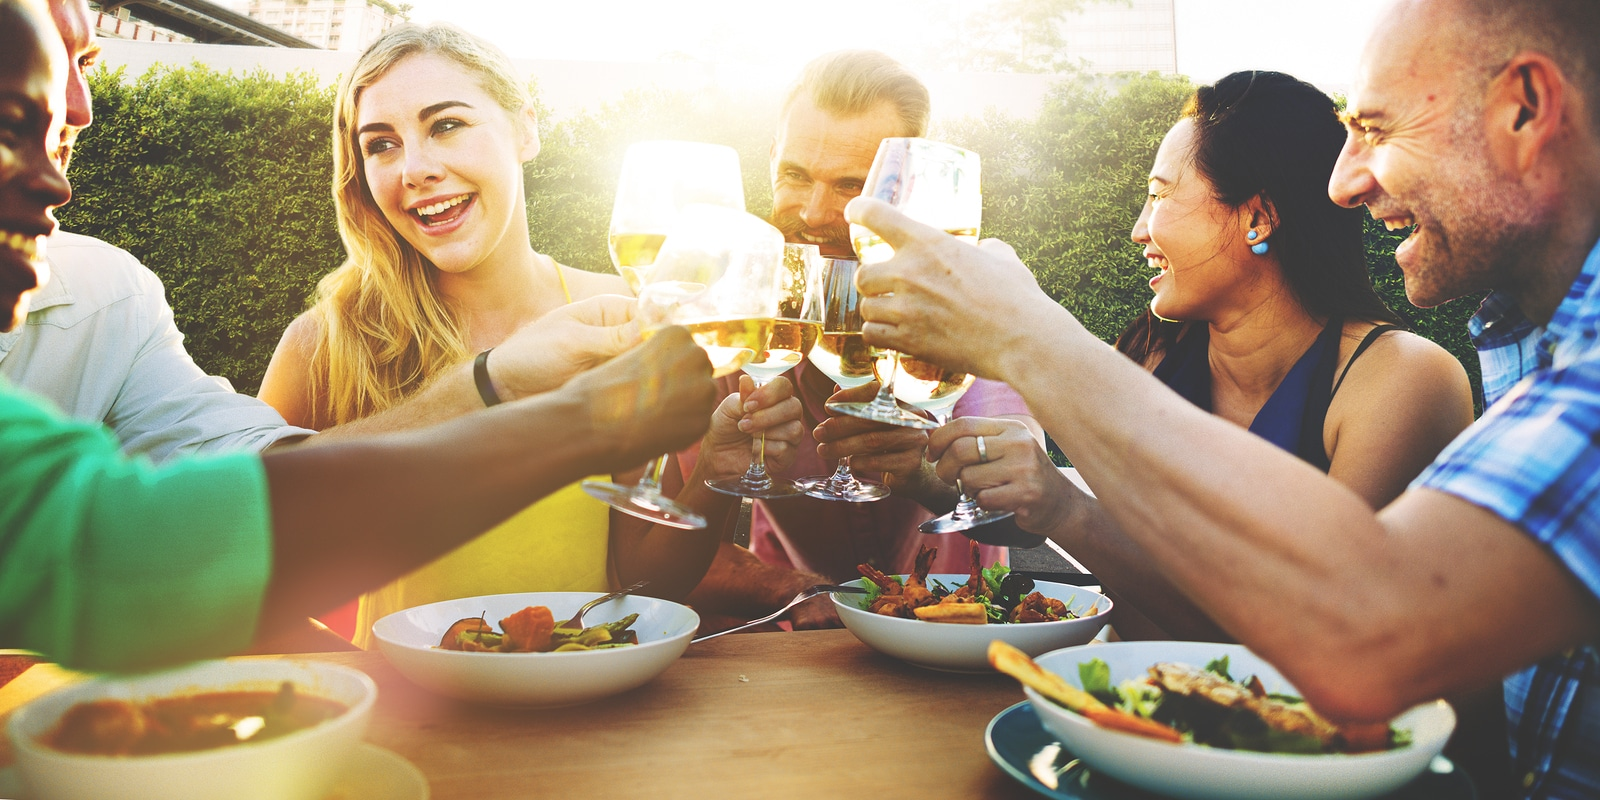 The Best Restaurants in St. Augustine in 2020